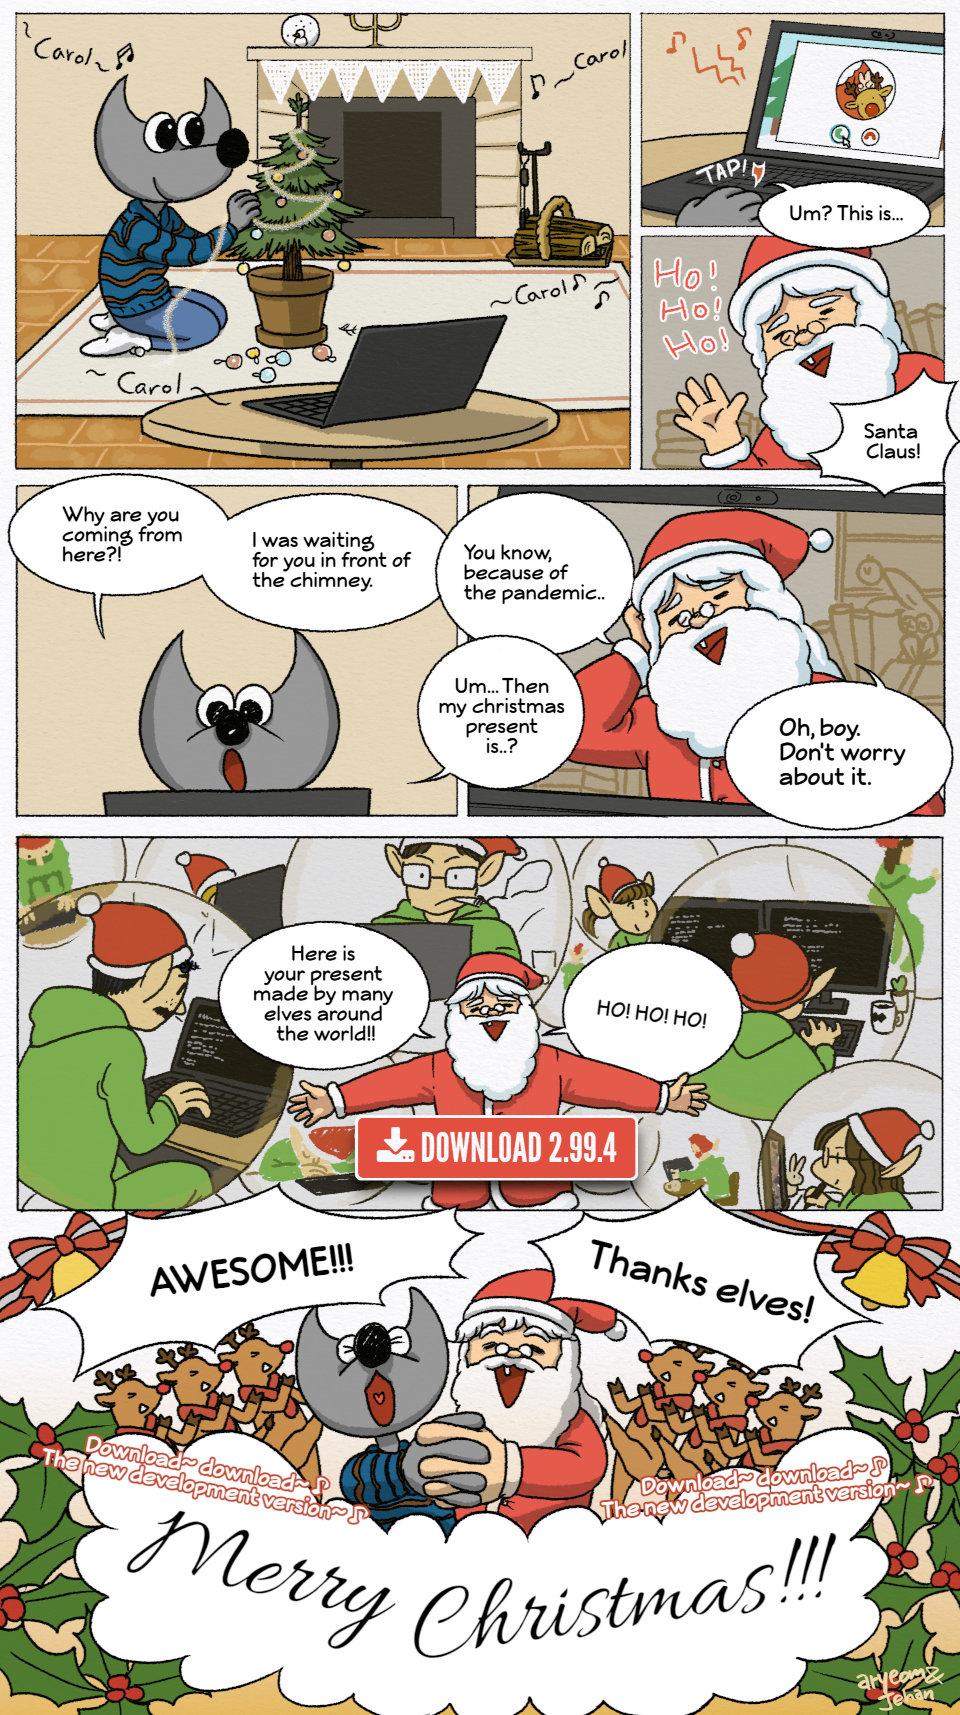 GIMP 2.99.4 present for Christmas! by Aryeom, CC by-sa